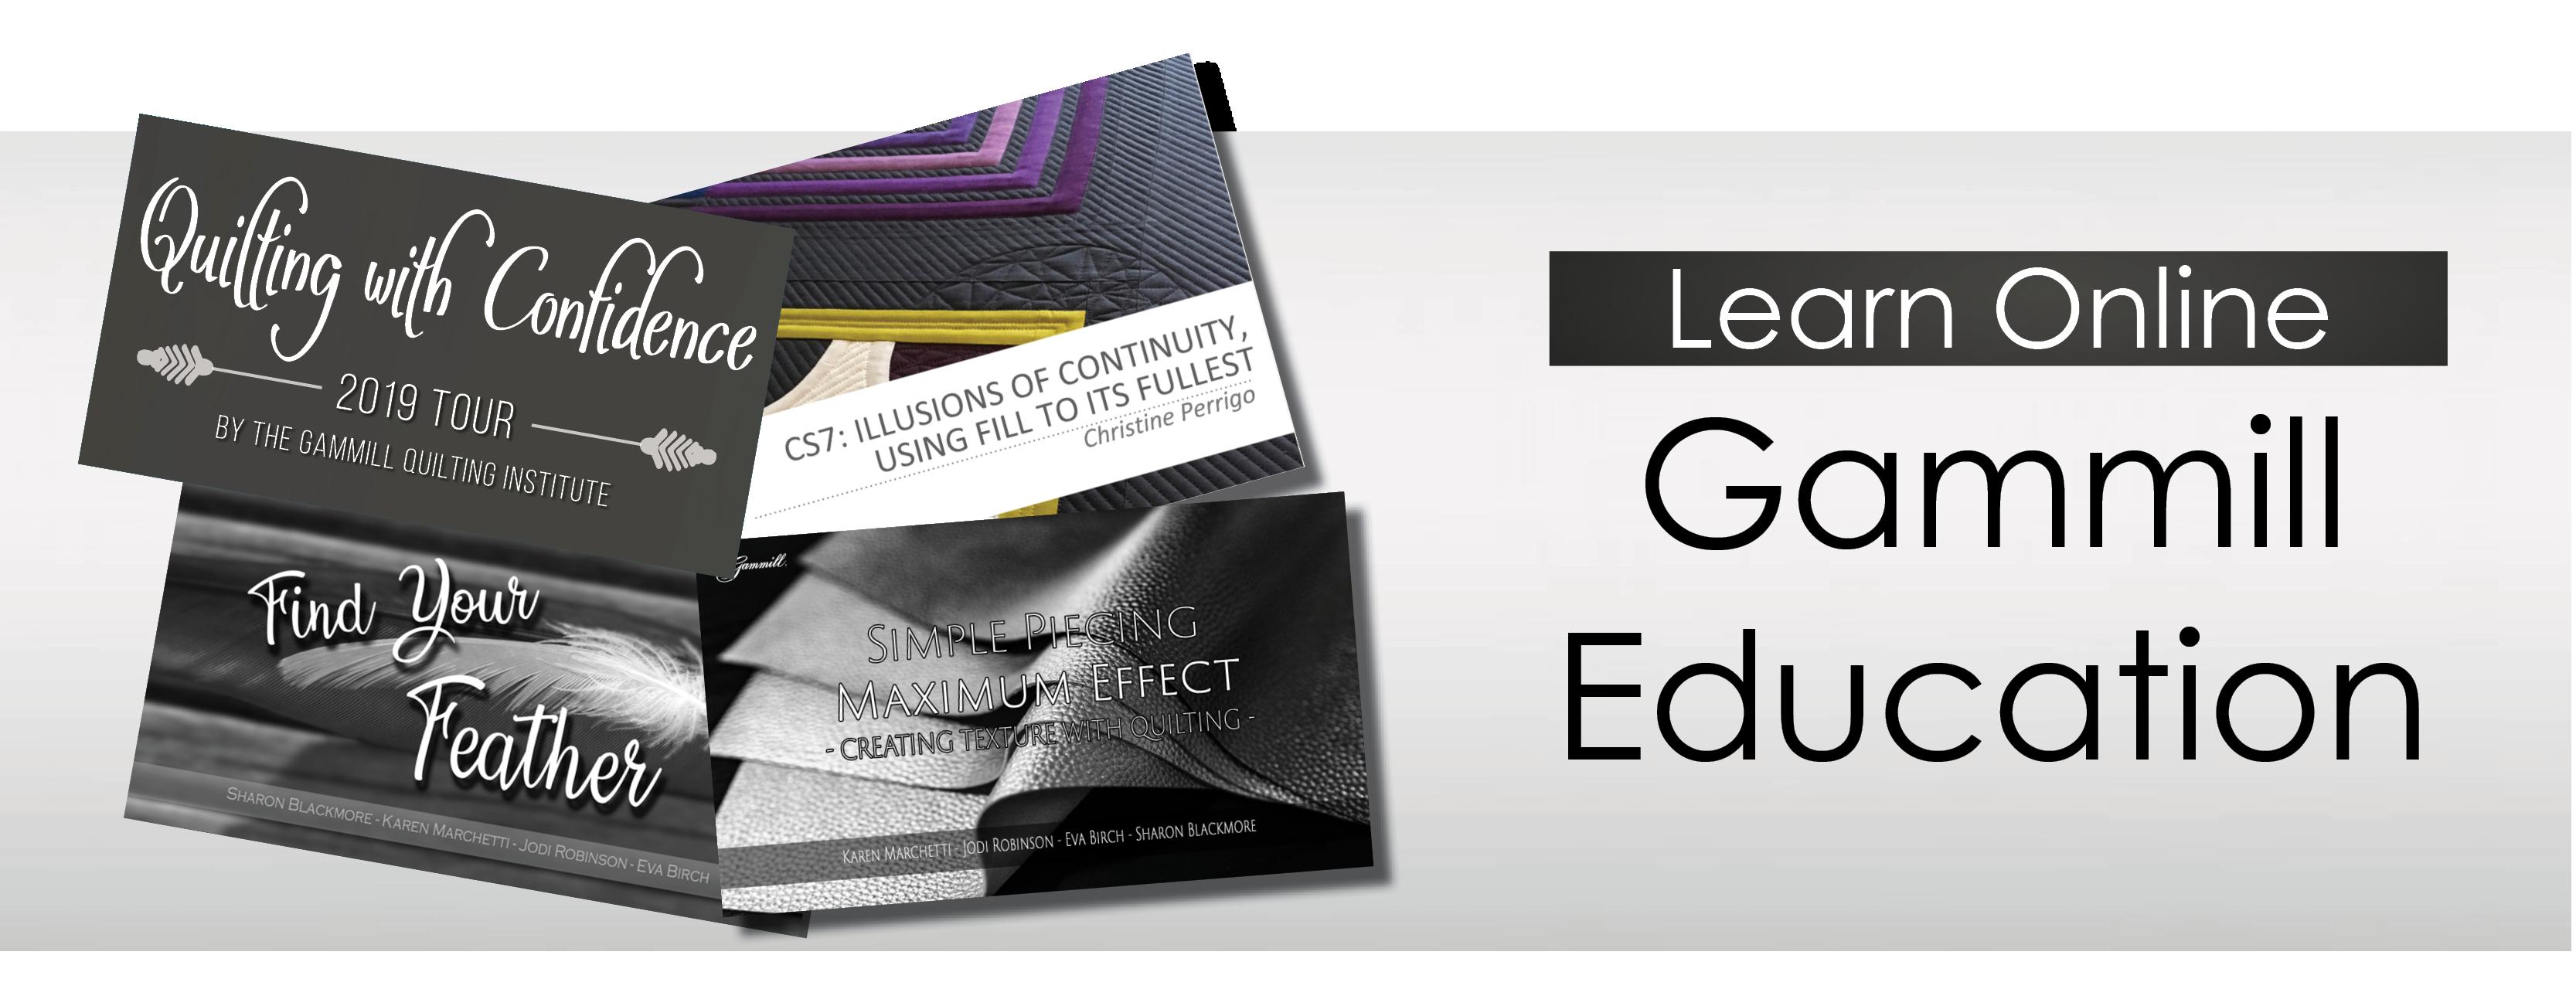 Gammill Education